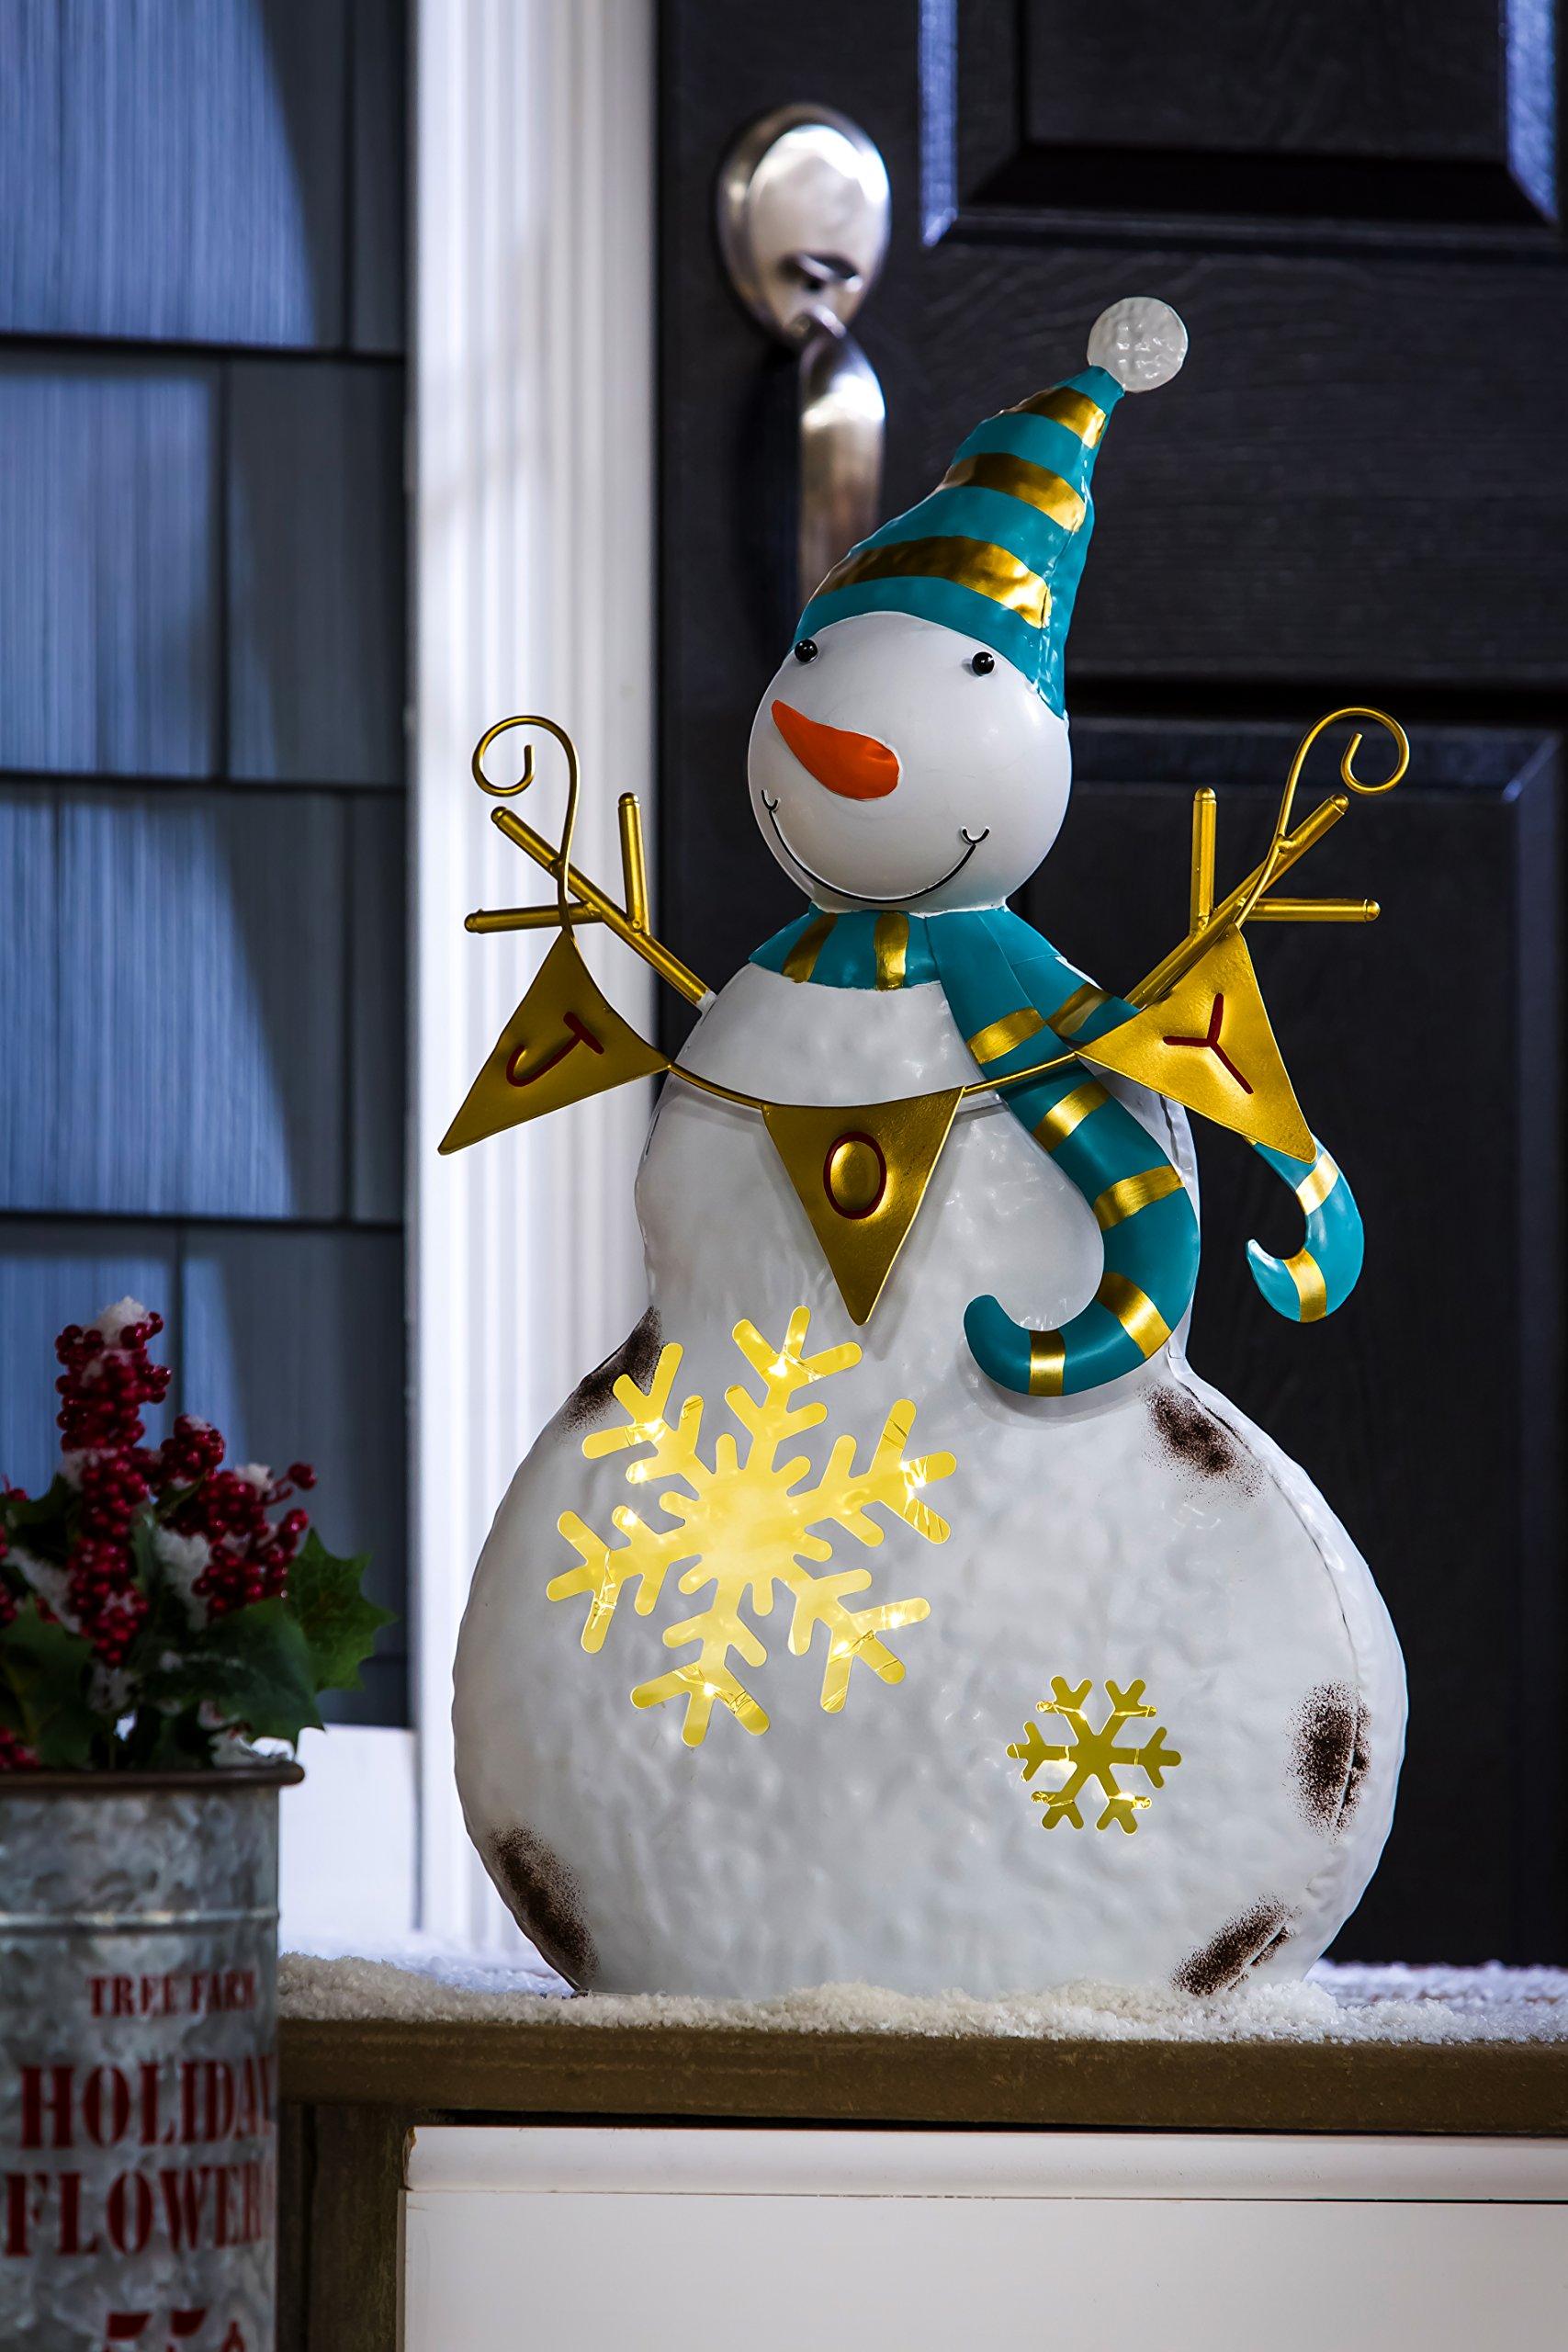 New Creative Joy Metal Snowman, illuminated LED Christmas Statue, Battery Operated